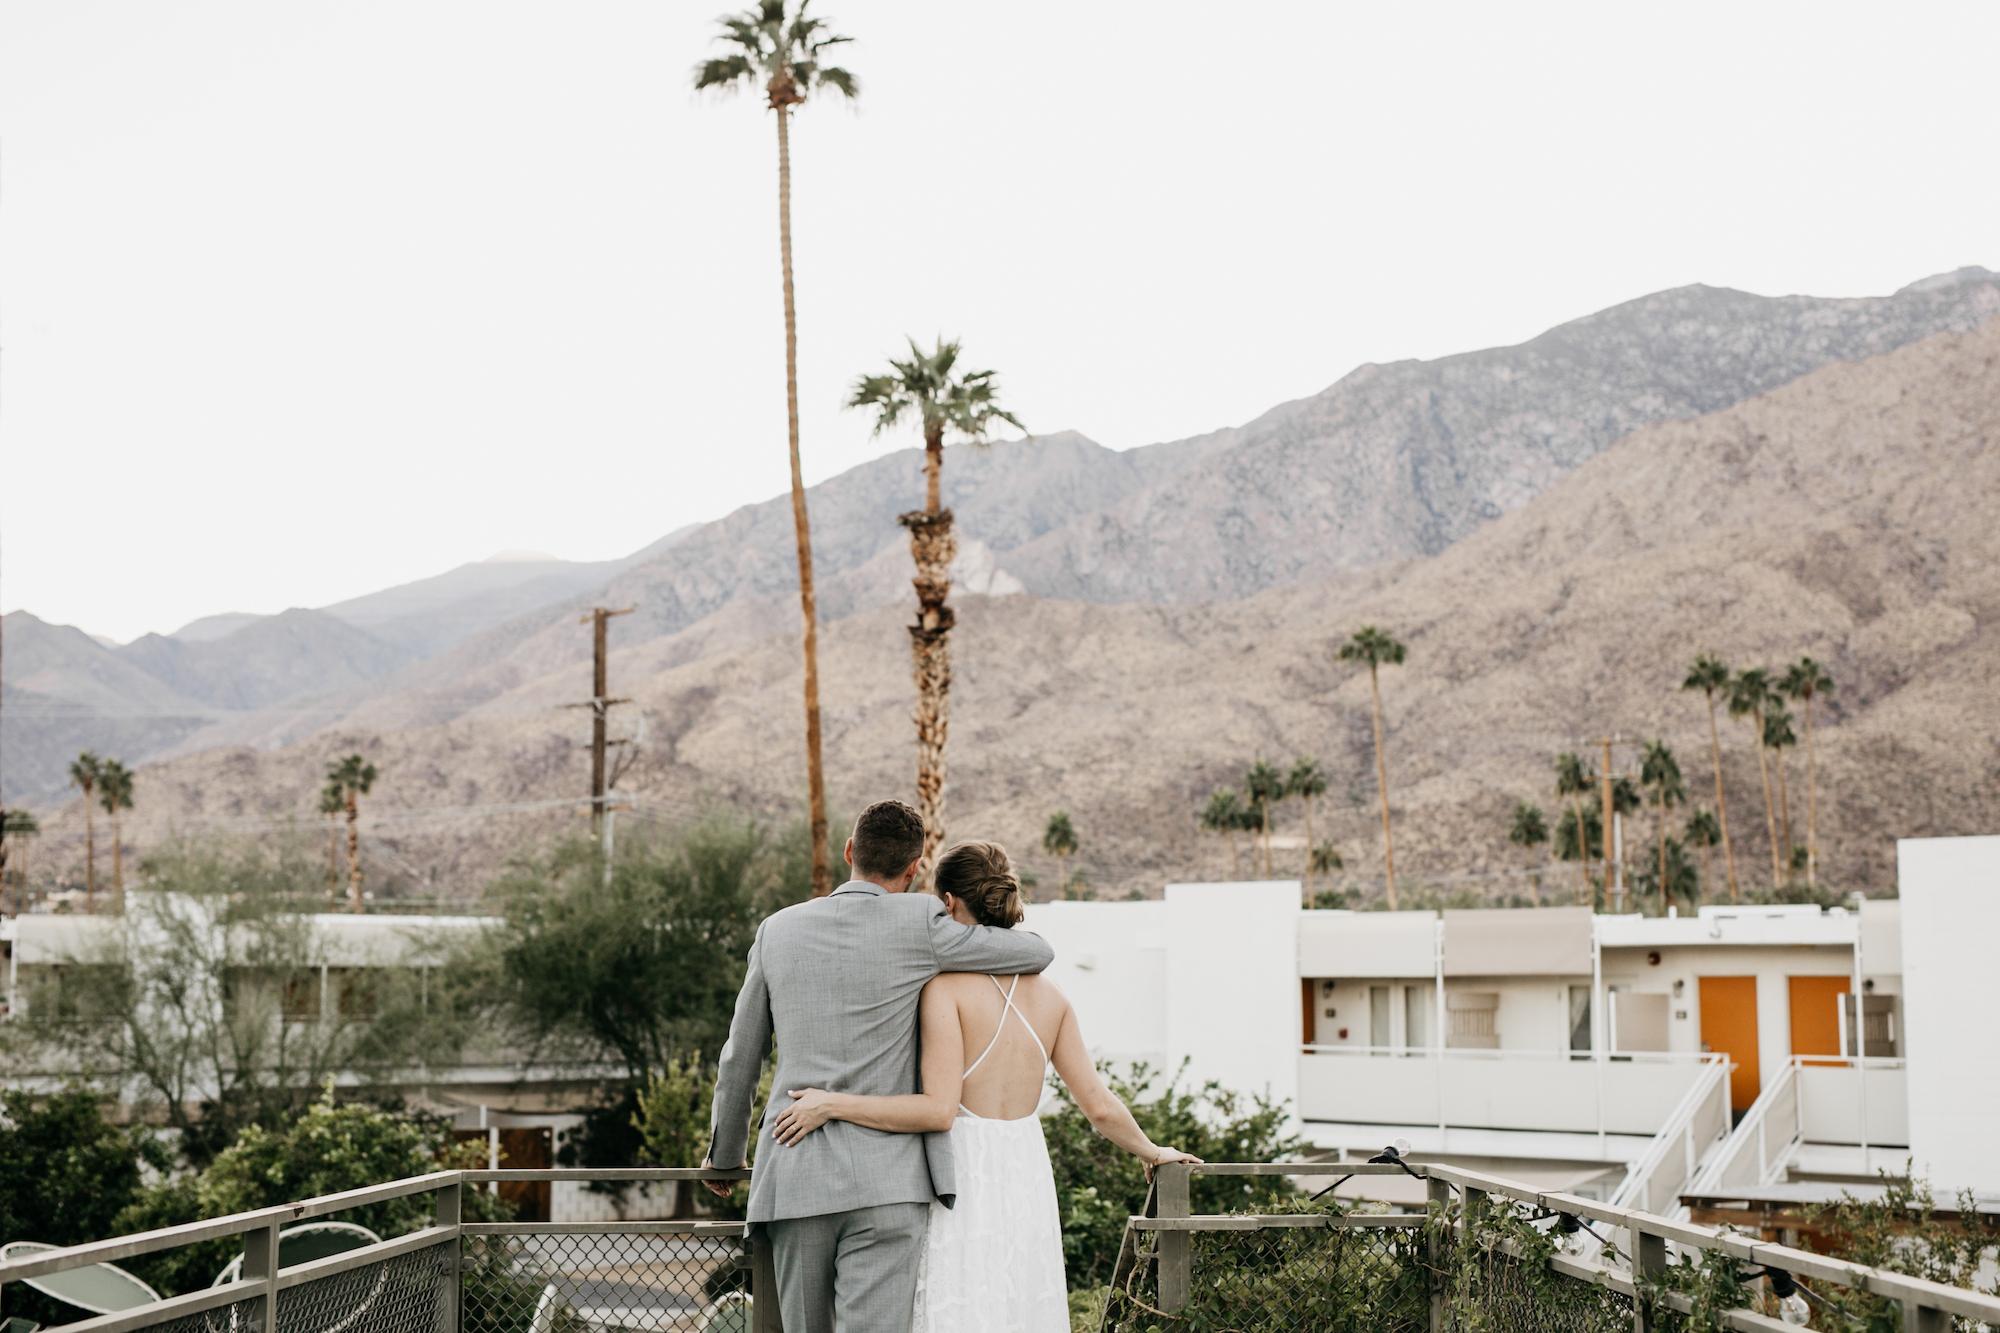 ace-hotel-palm-springs-wedding-photographer646.jpg